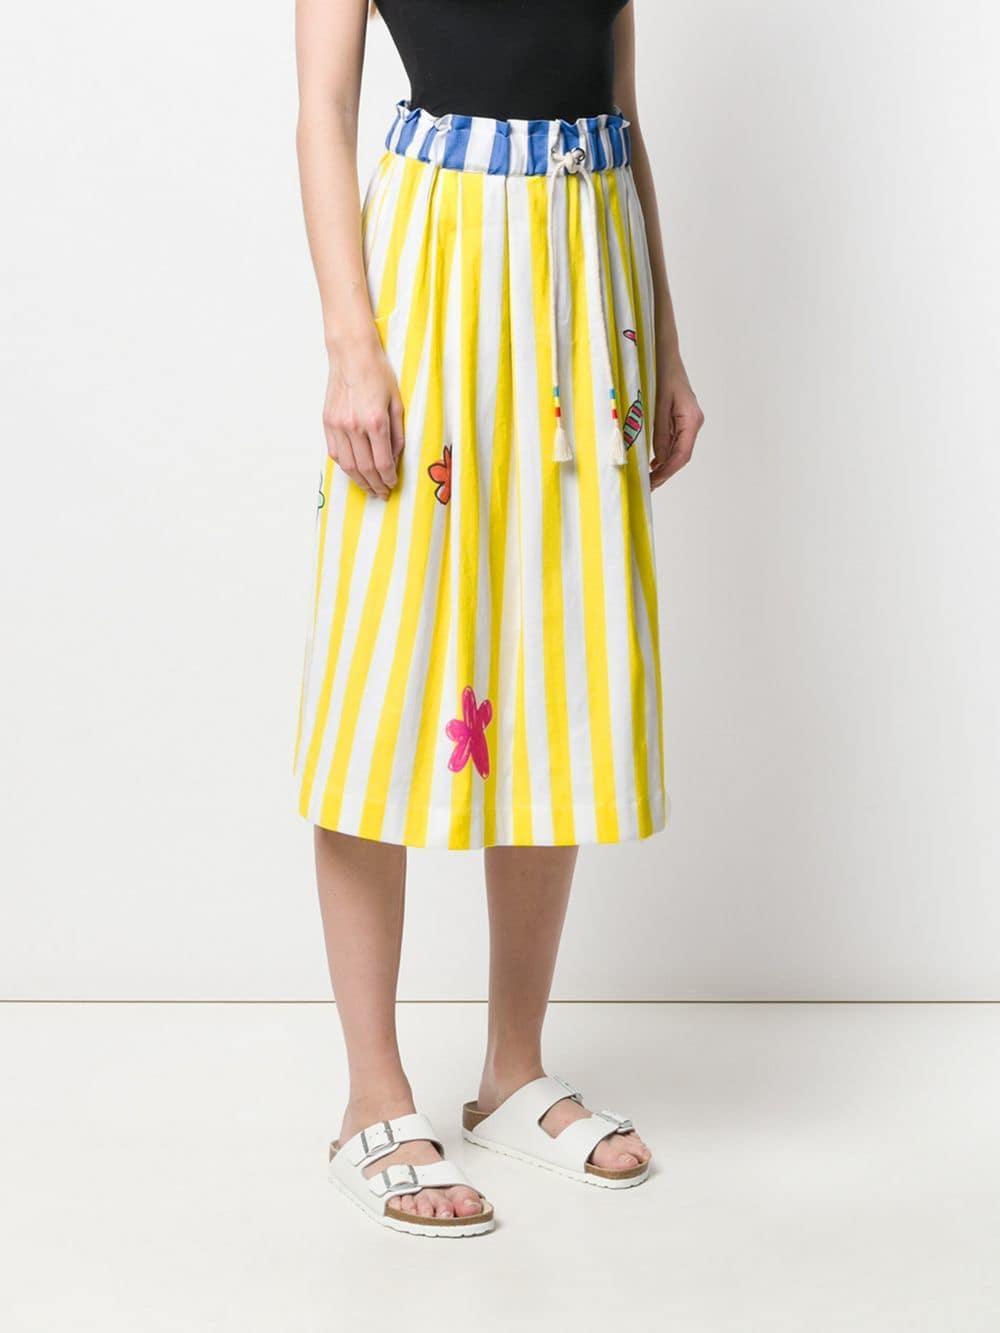 de23009caff7 MIRA MIKATI - Yellow Striped Graphic Skirt - Lyst. View fullscreen